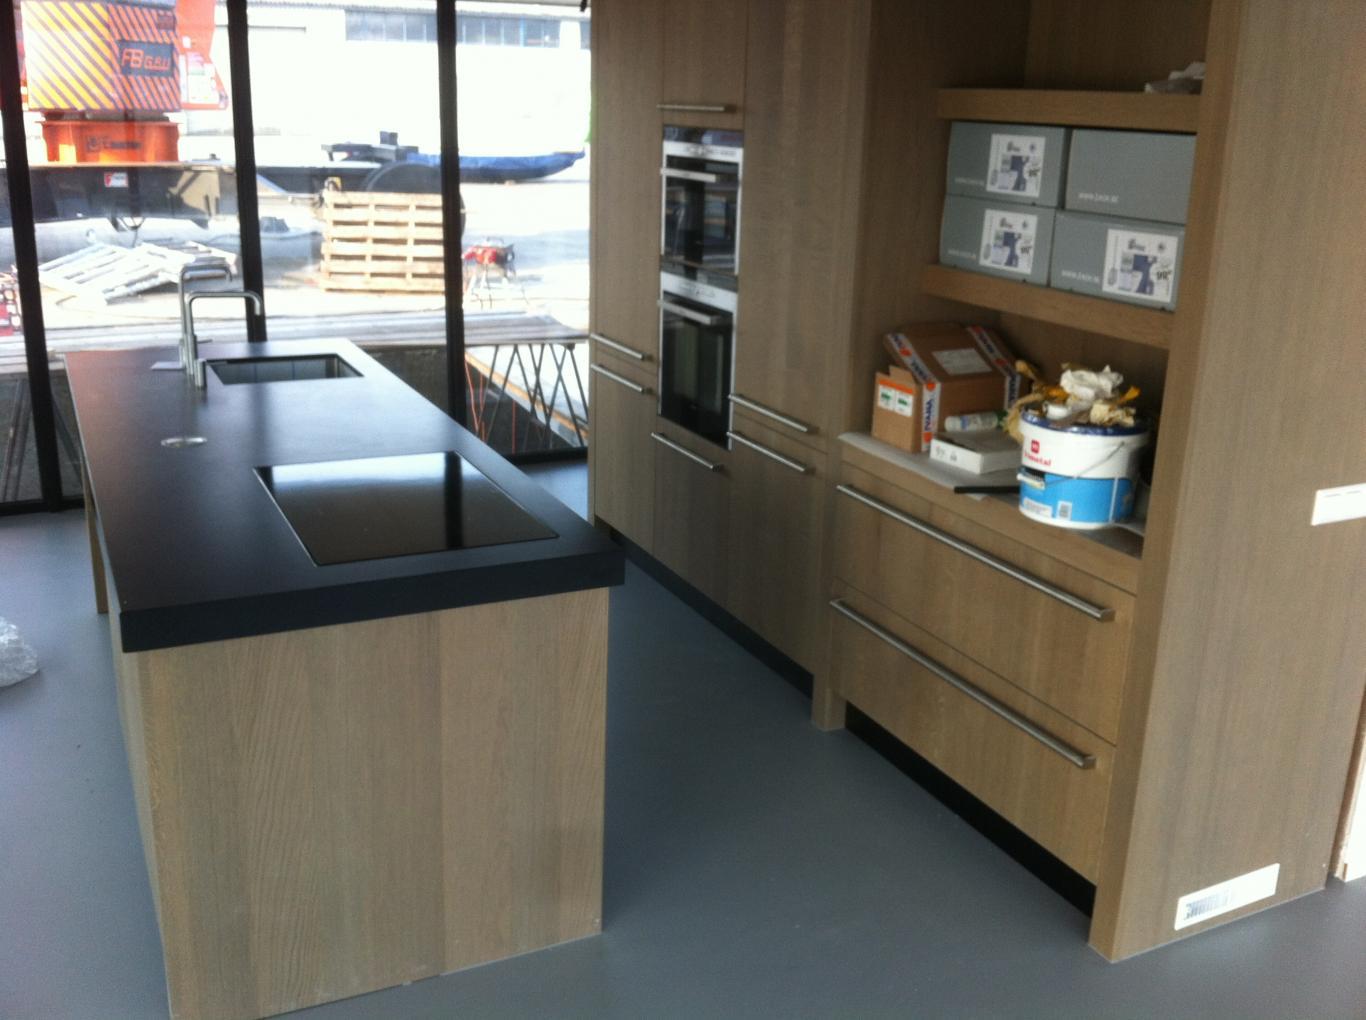 Design Keukens Grou : Luxe woonboten te grou keuken de bouwhorst